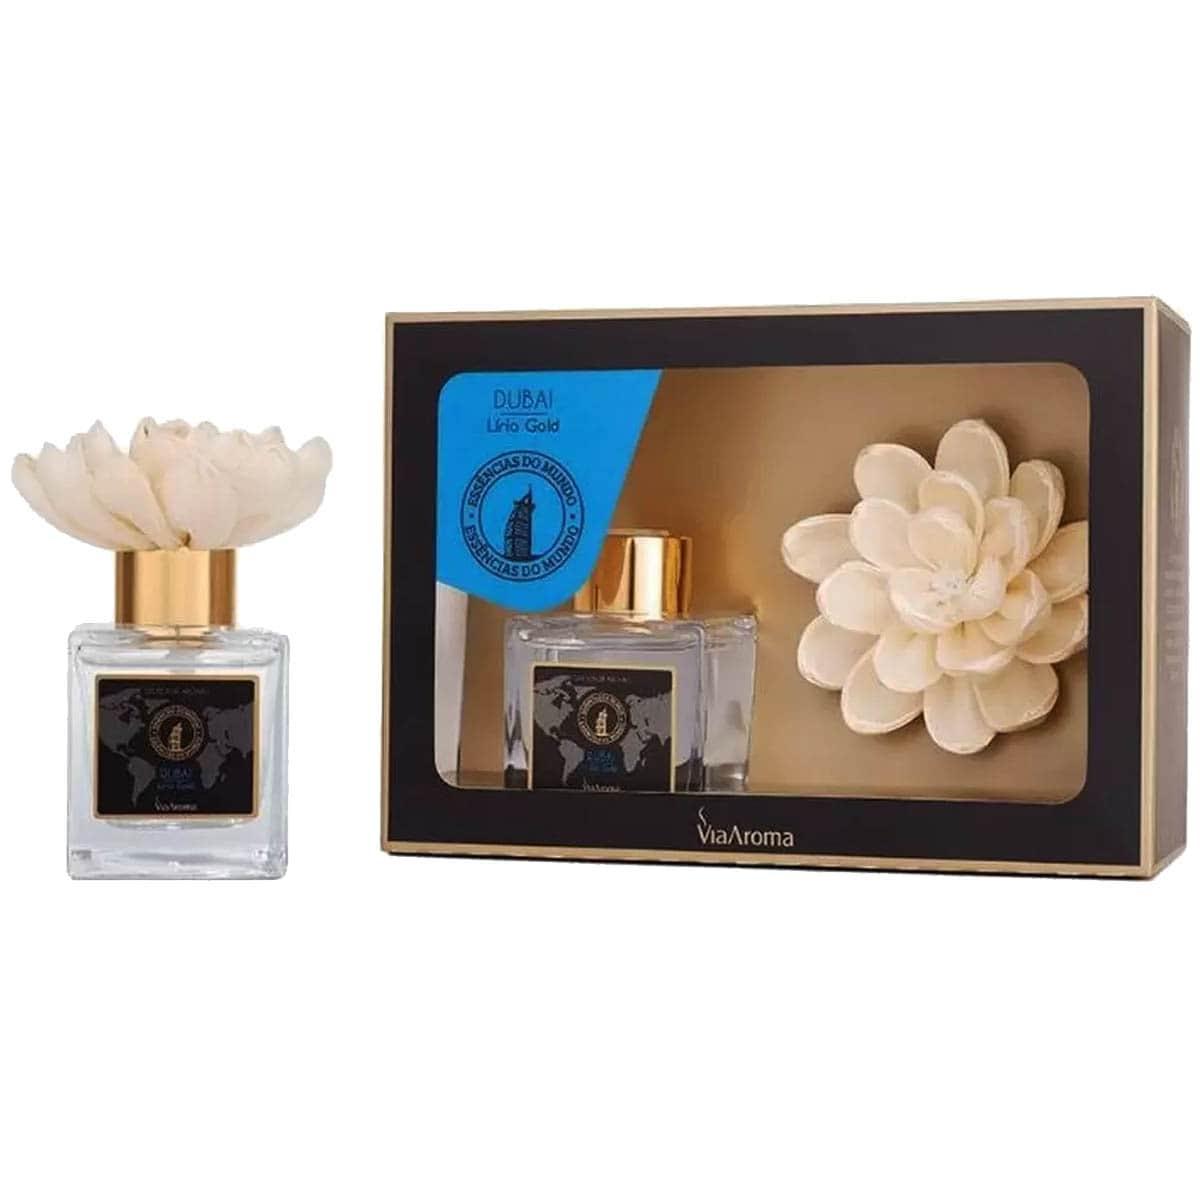 Flor difusora dubai - Via aroma